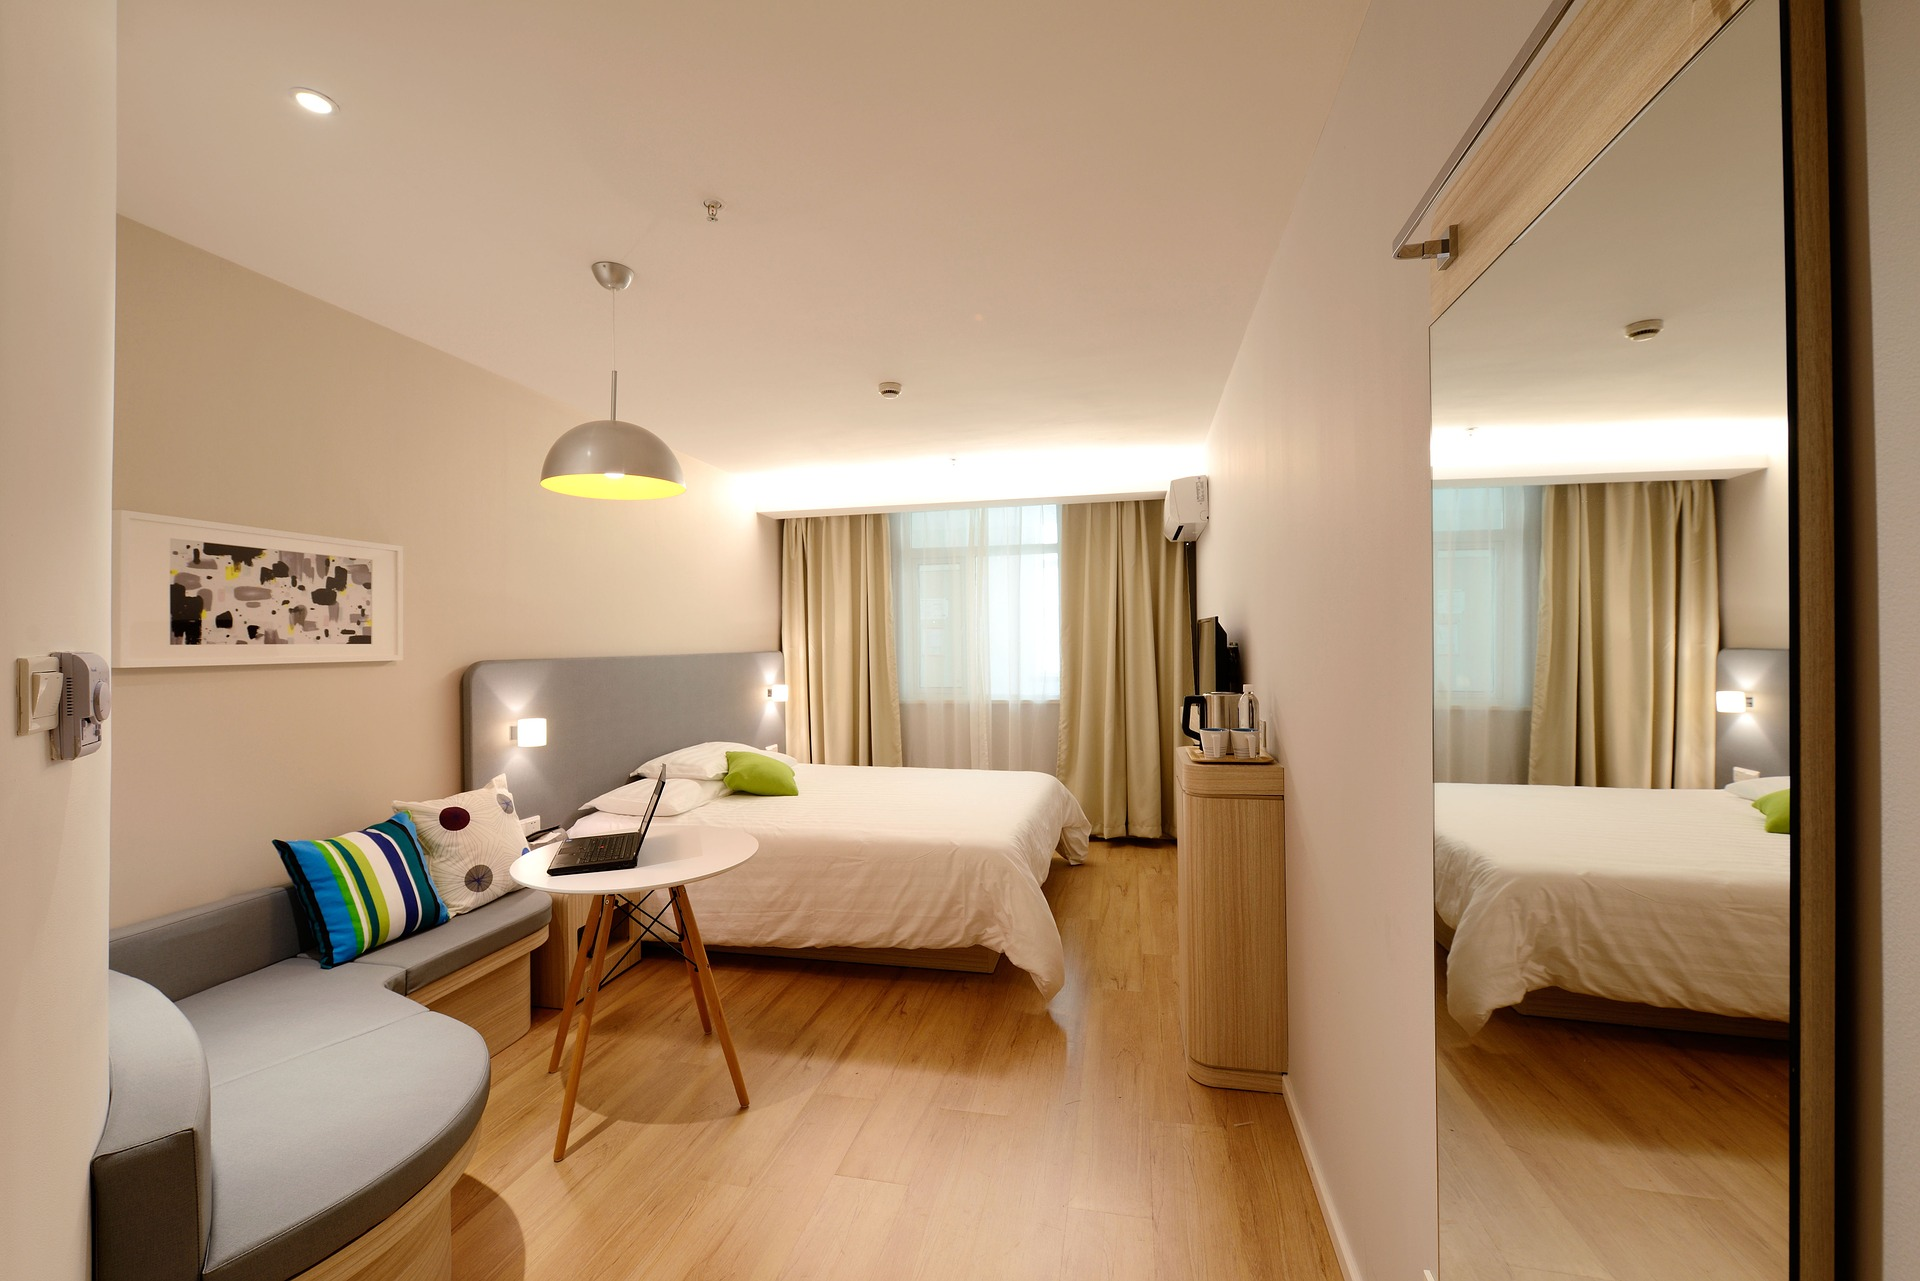 hotel-1330841_1920.jpg